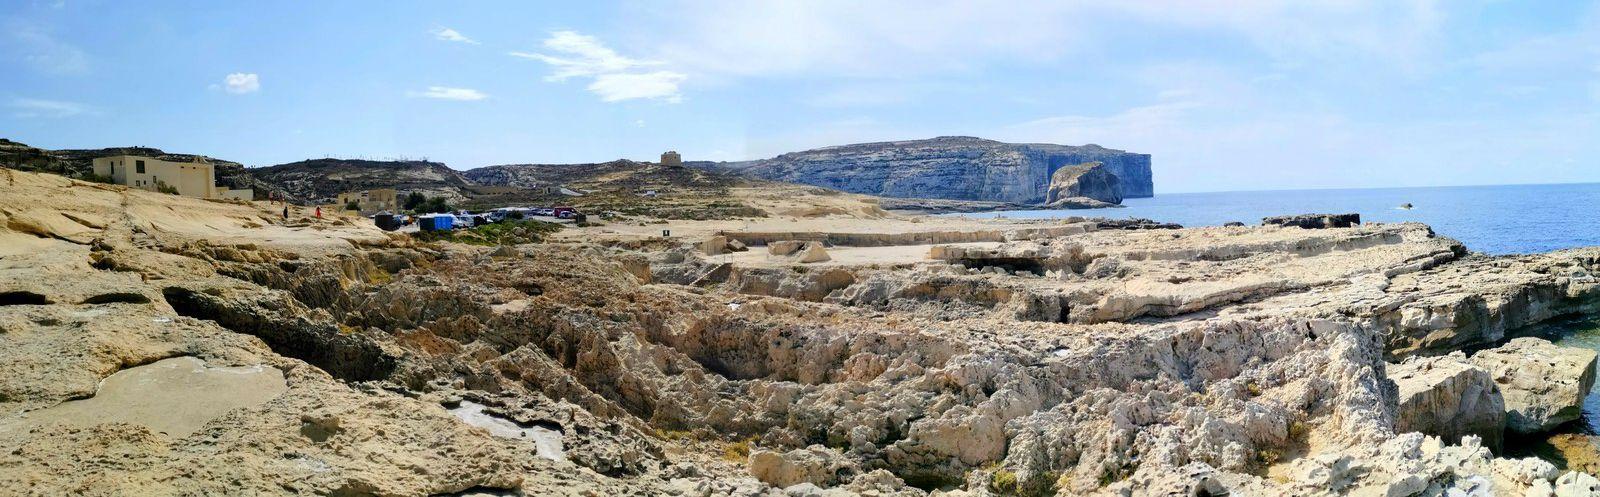 Dwejra Bay, Gozo